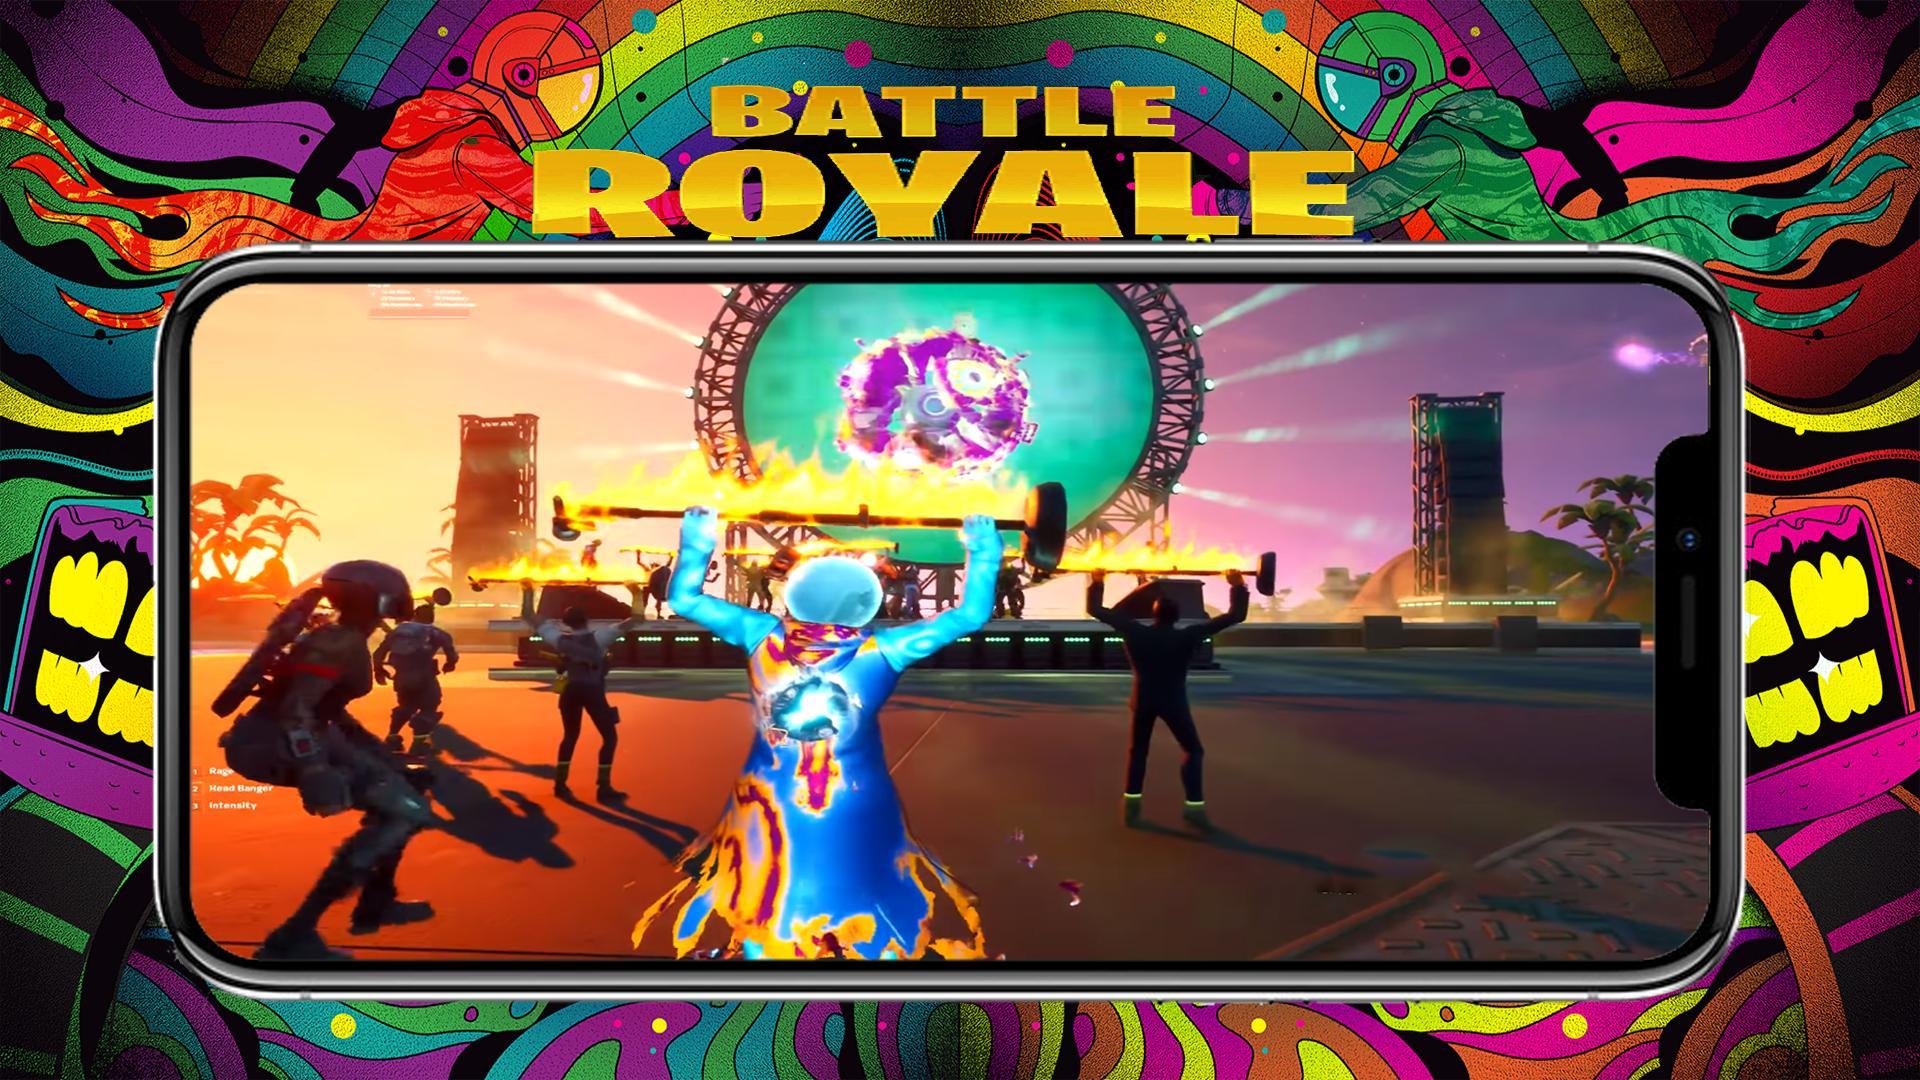 Wallpaper Fortnite Battle Royale For Android Apk Download